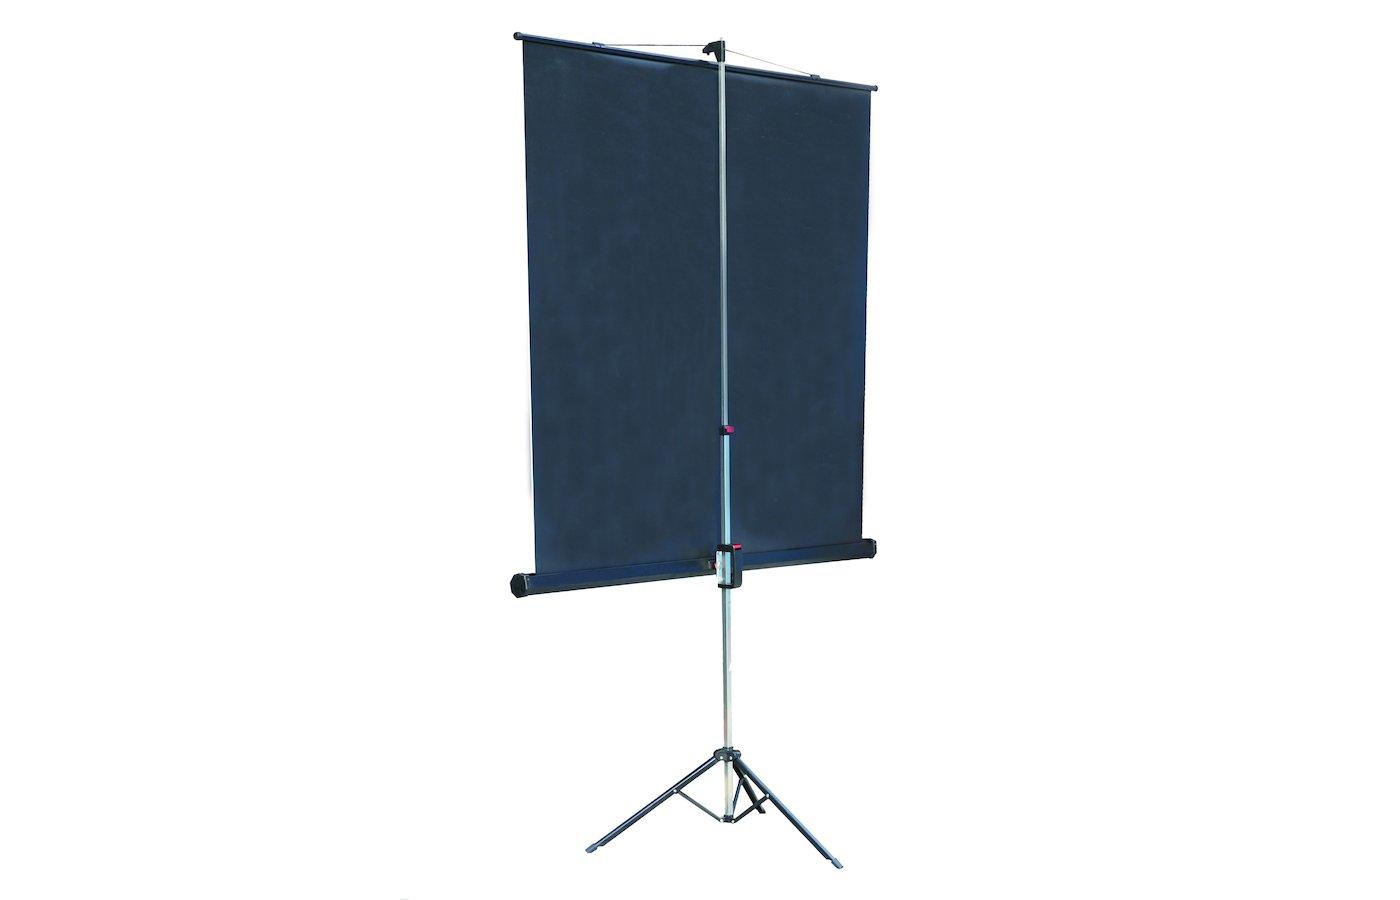 Экран для проектора LUMIEN Master View 85 128х171 4:3 (LMV-100106) штатив